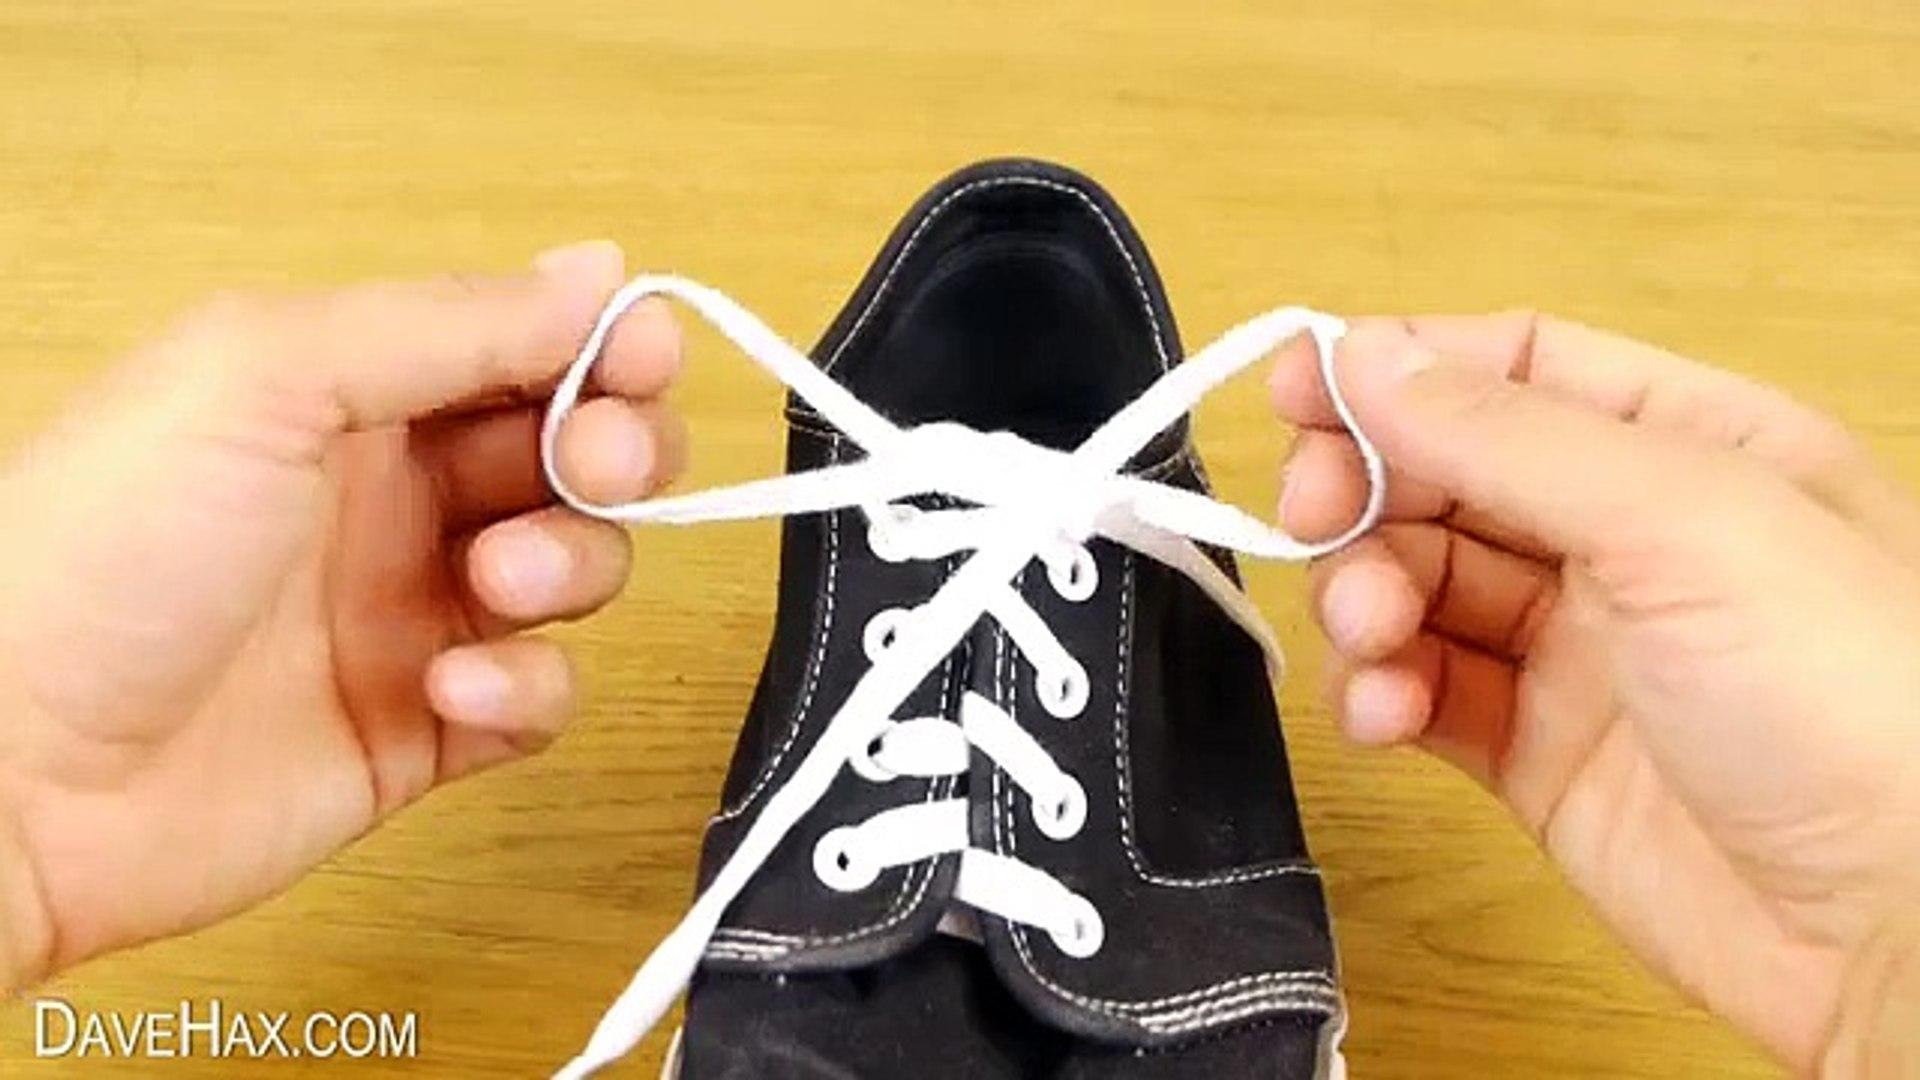 How to Tie Shoe Laces - Teach Children